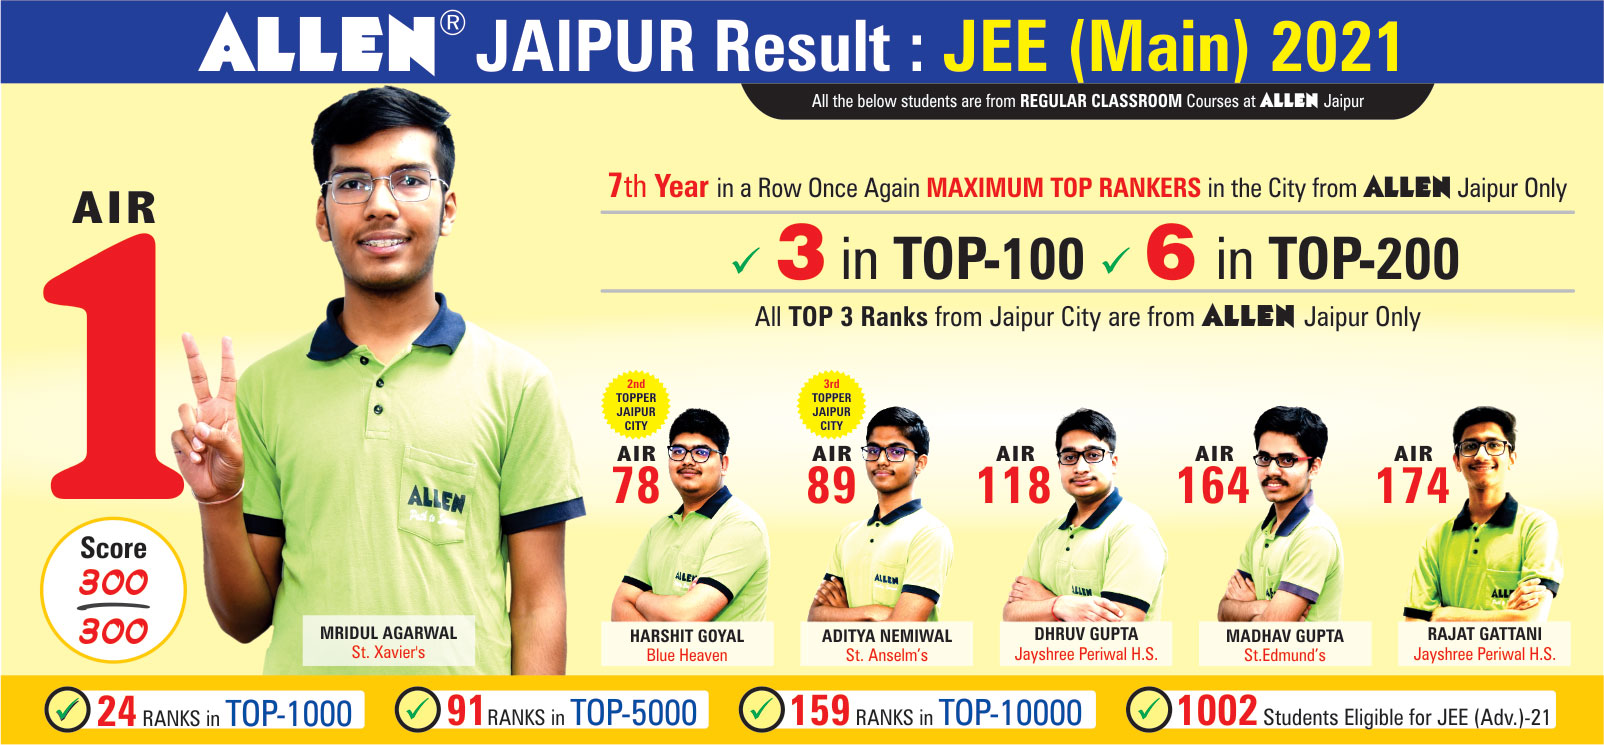 JEE (Main) Result 2021 17-09-2021 1840